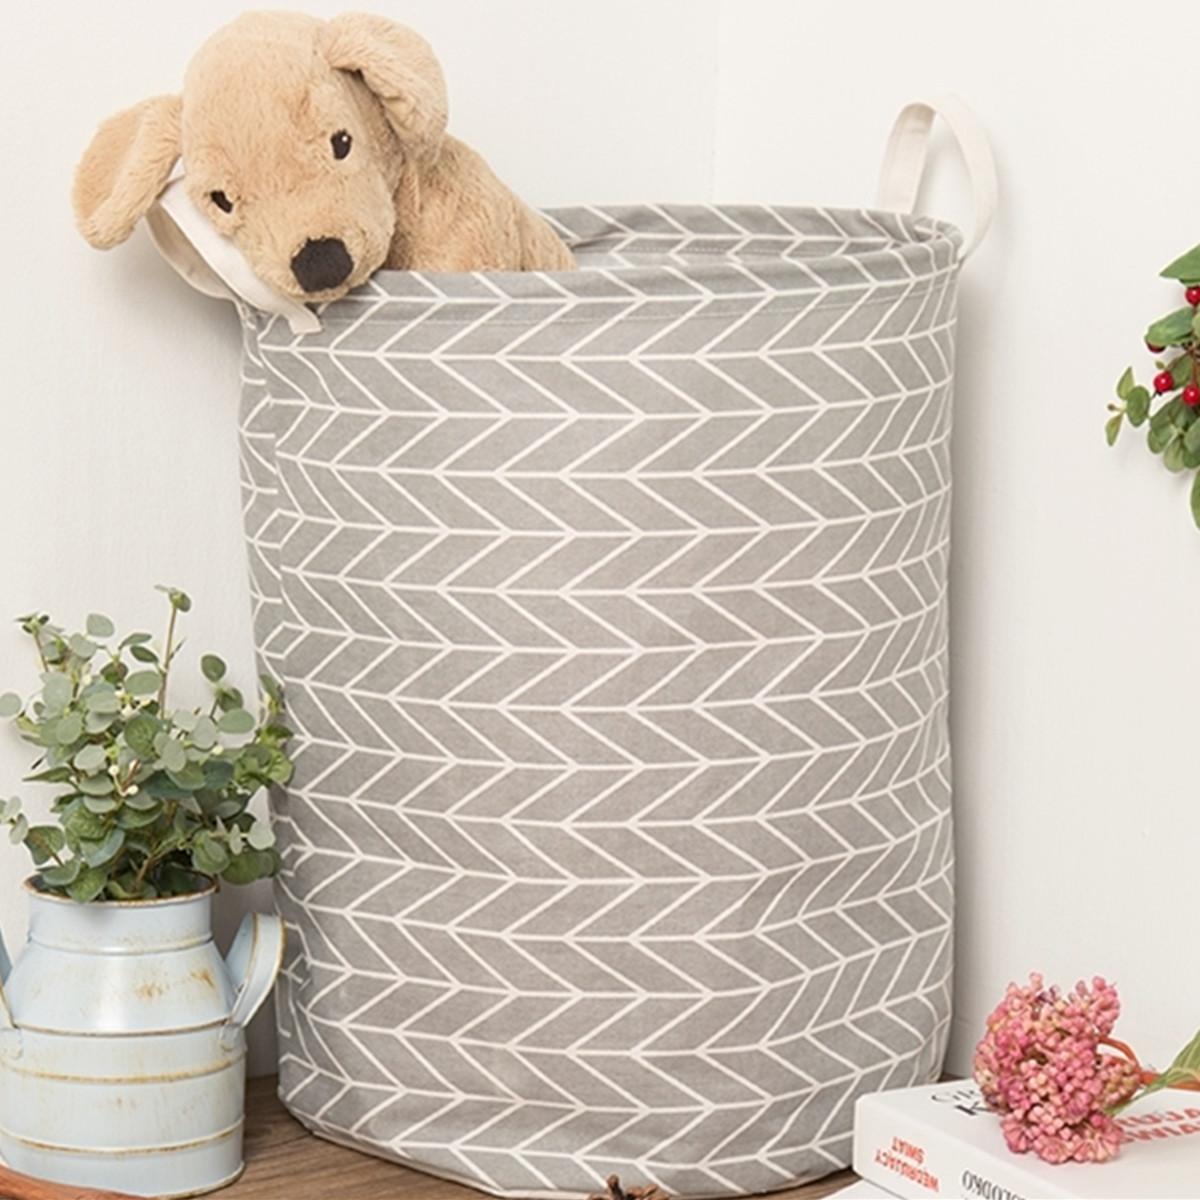 Grtsunsea Foldable Cotton Linen Dirty Washing Clothes Laundry Basket Hamper Toy Storage Organizer Case Bag Home Bathroom Dormitory Househodl Decor